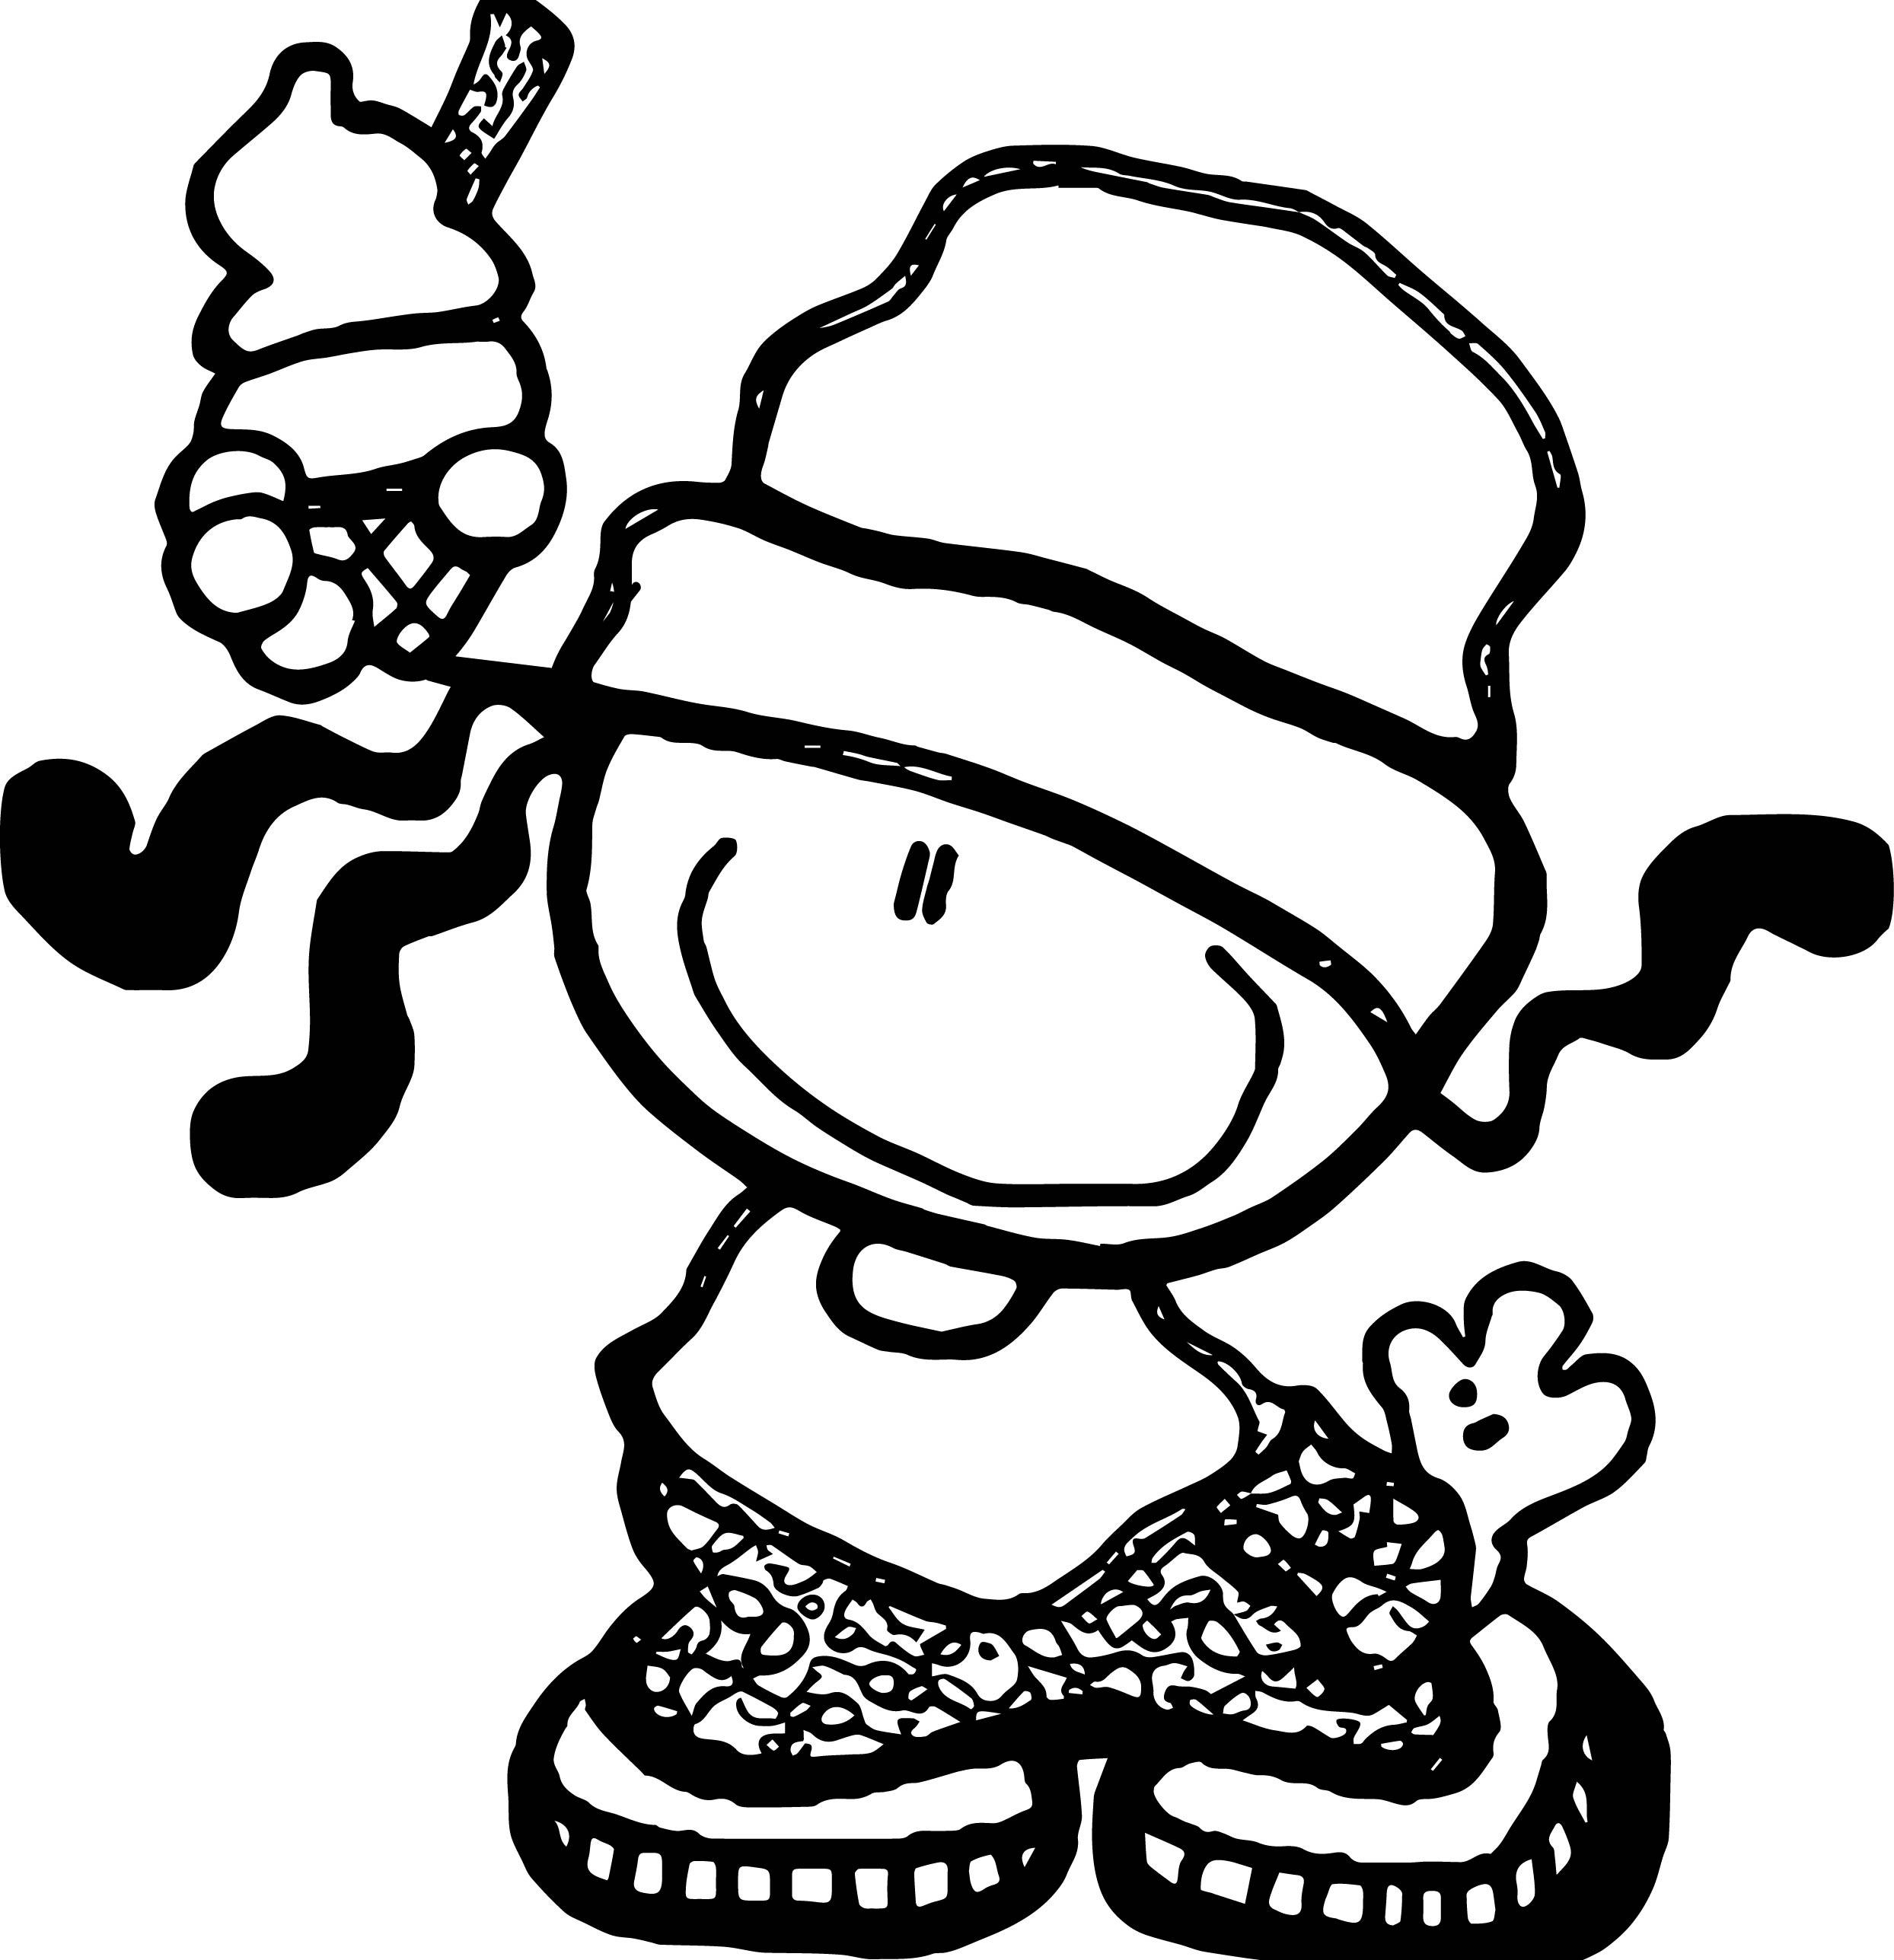 Bubblegum Kids Ice Cream Coloring Page